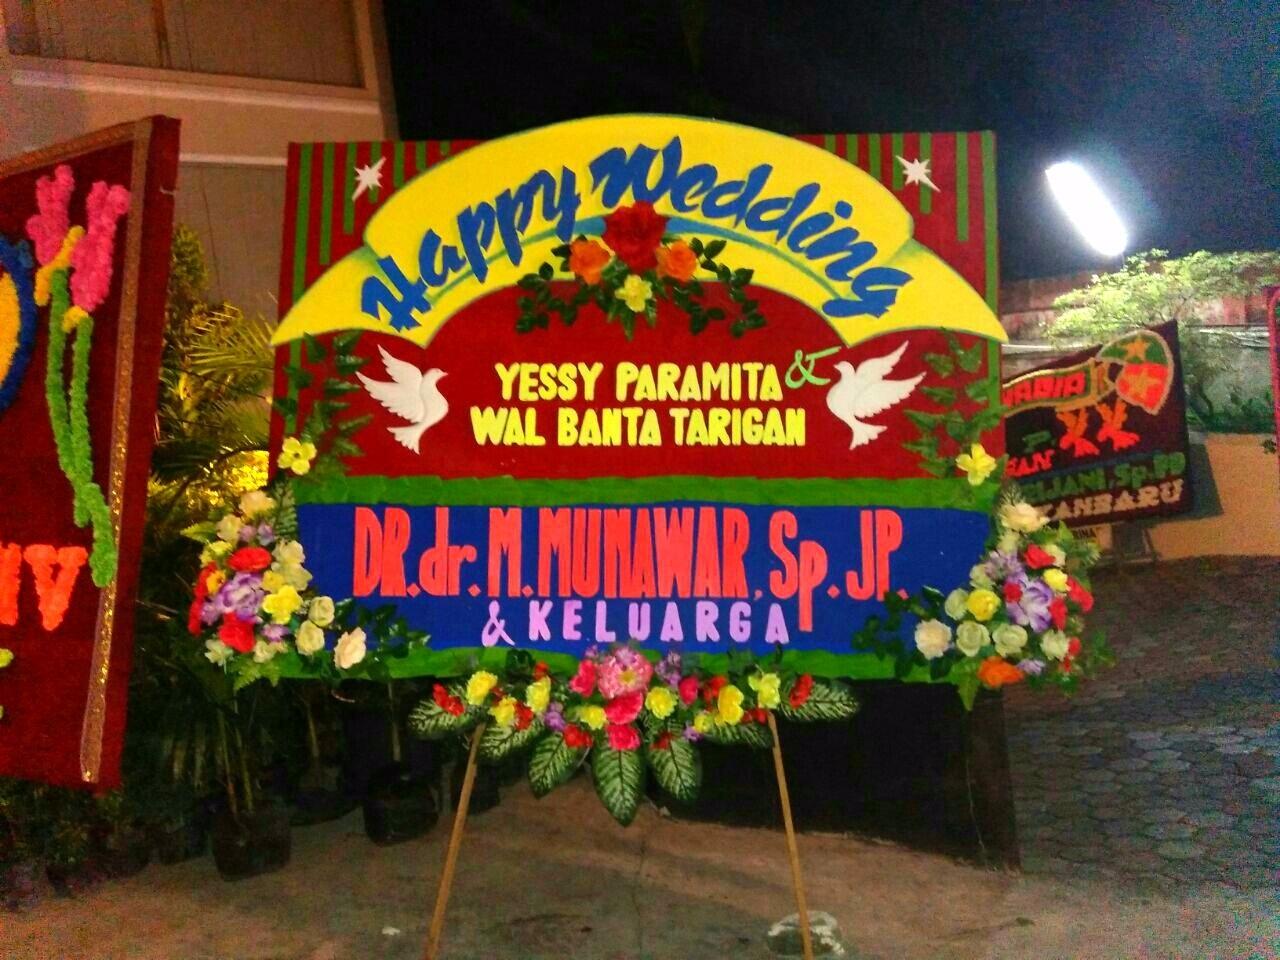 Bunga Papan Jogja - Bunga ucapan wedding pekanbaru